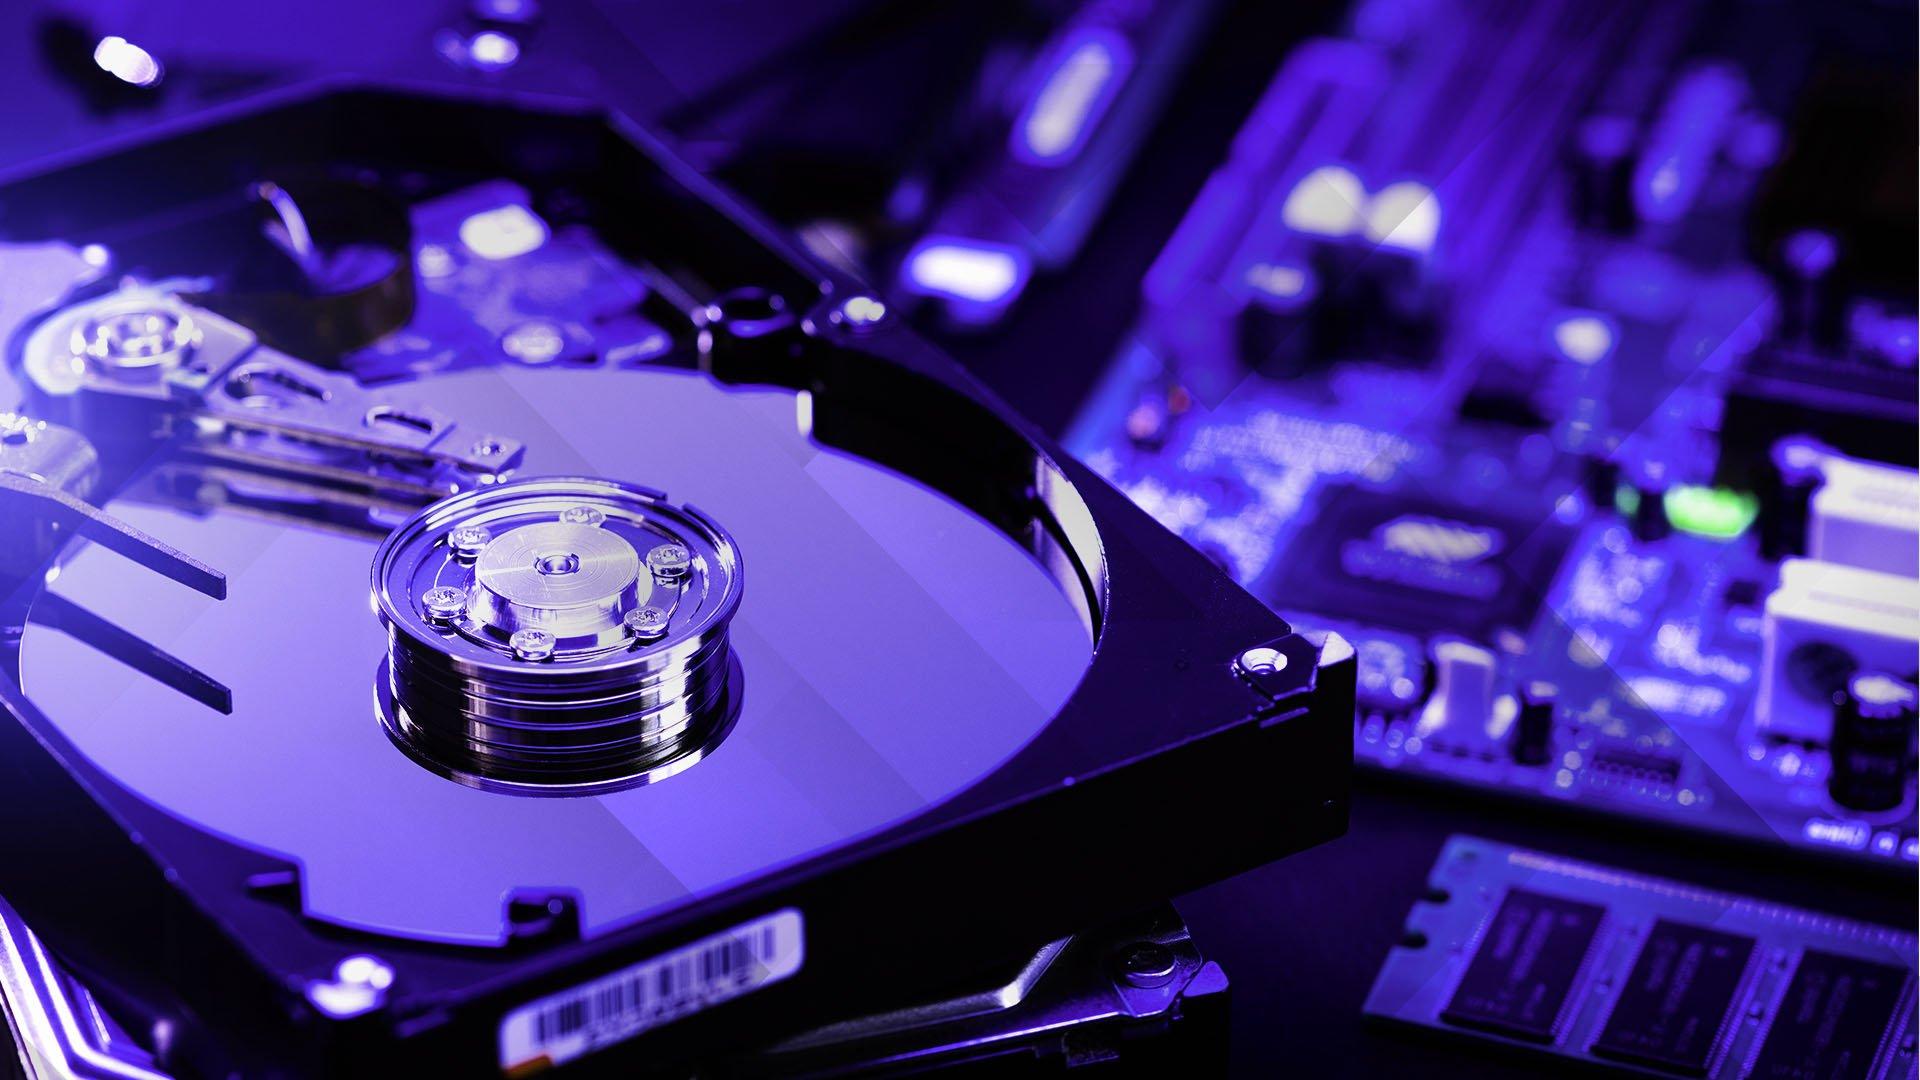 Daten, Speicher, Festplatte, Hdd, Festplatten, Datenübertragung, Datentransfer, Speichermedien, Datenträger, festplattenanalyse, speichermedium, Memory, datenspeicher, Platter, HDDs